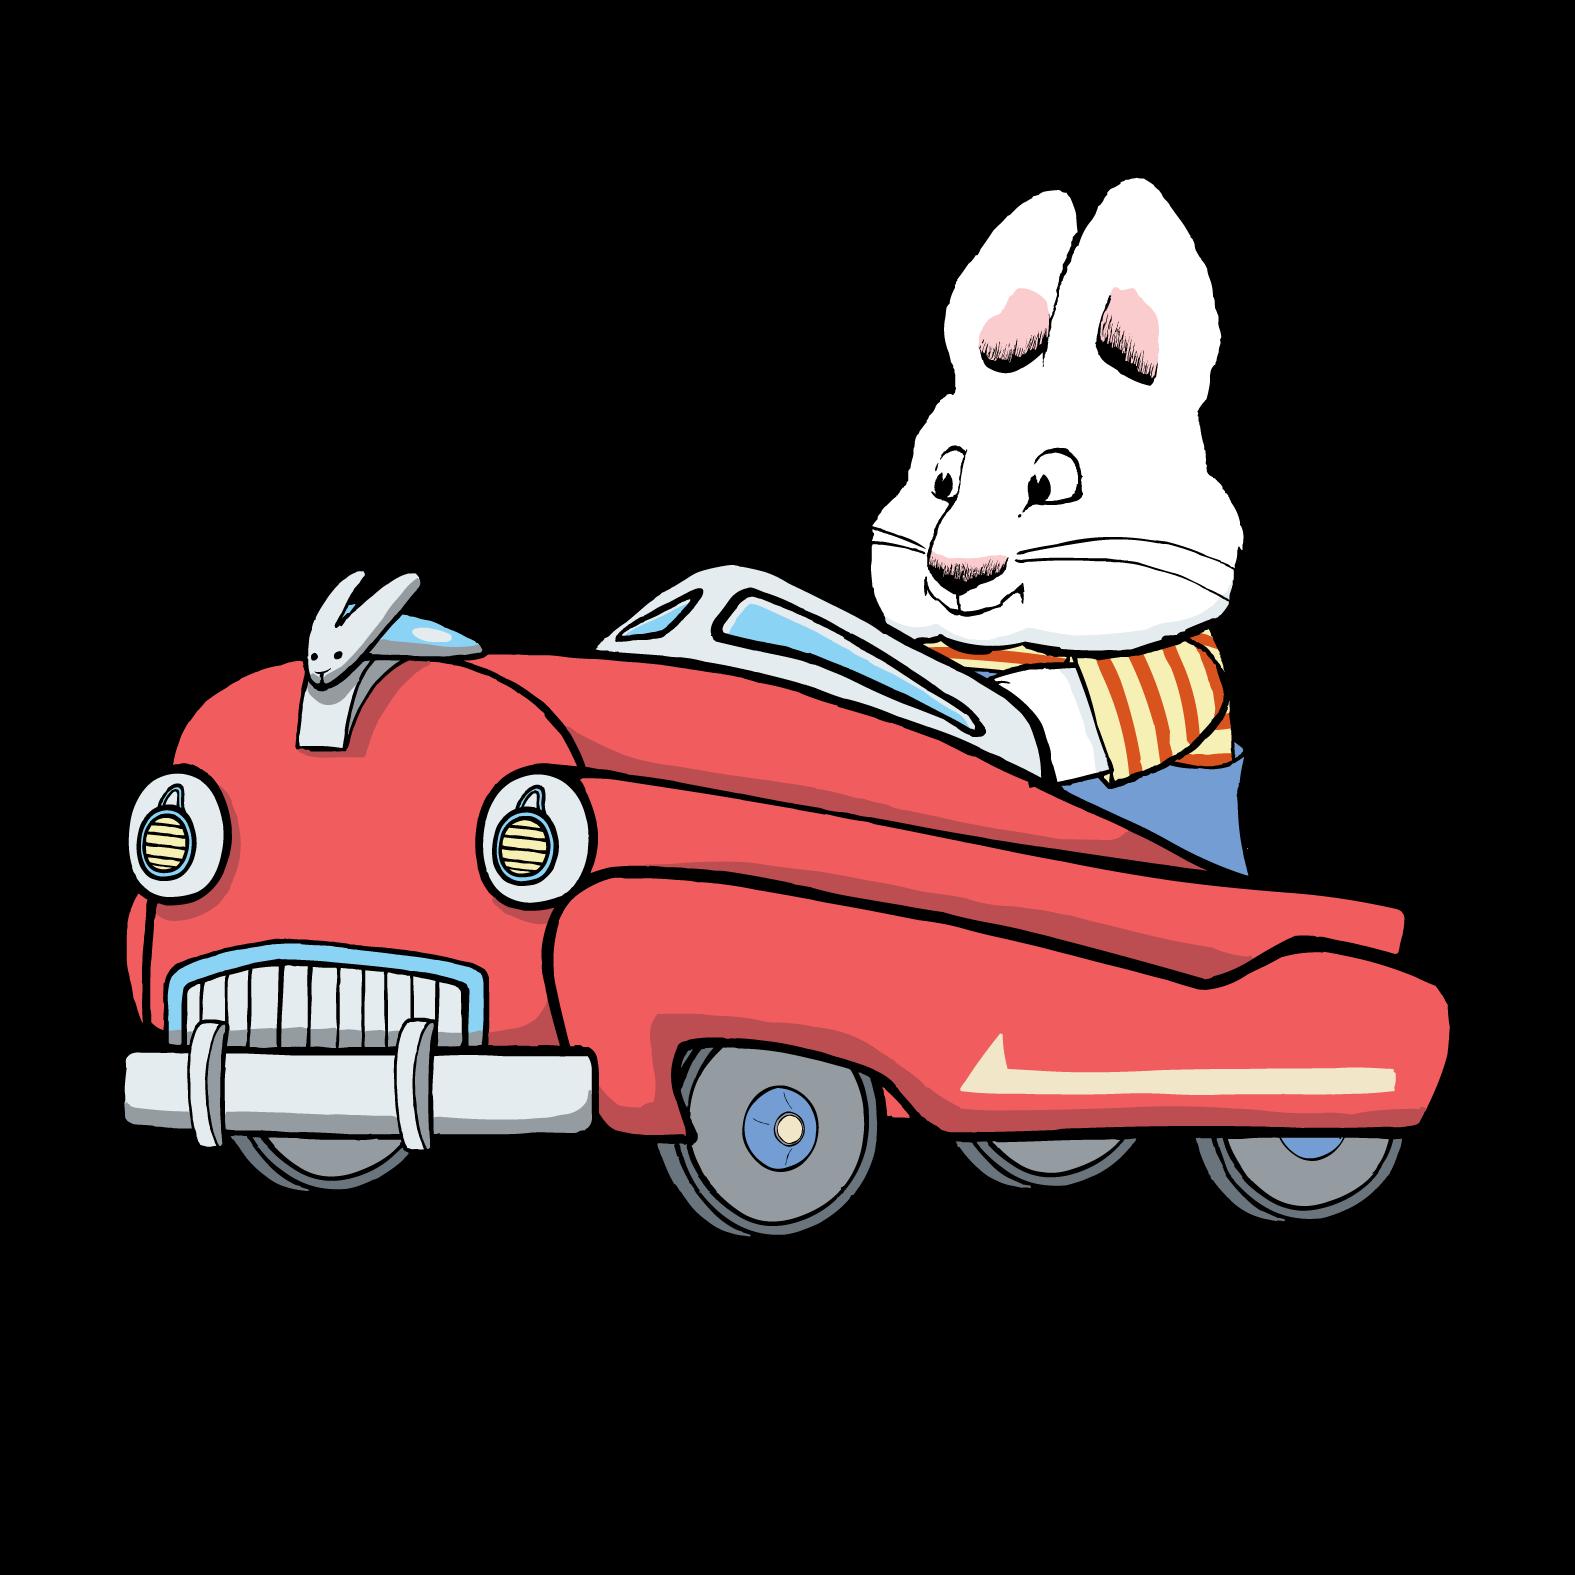 Cartoon Characters: Max & Ruby